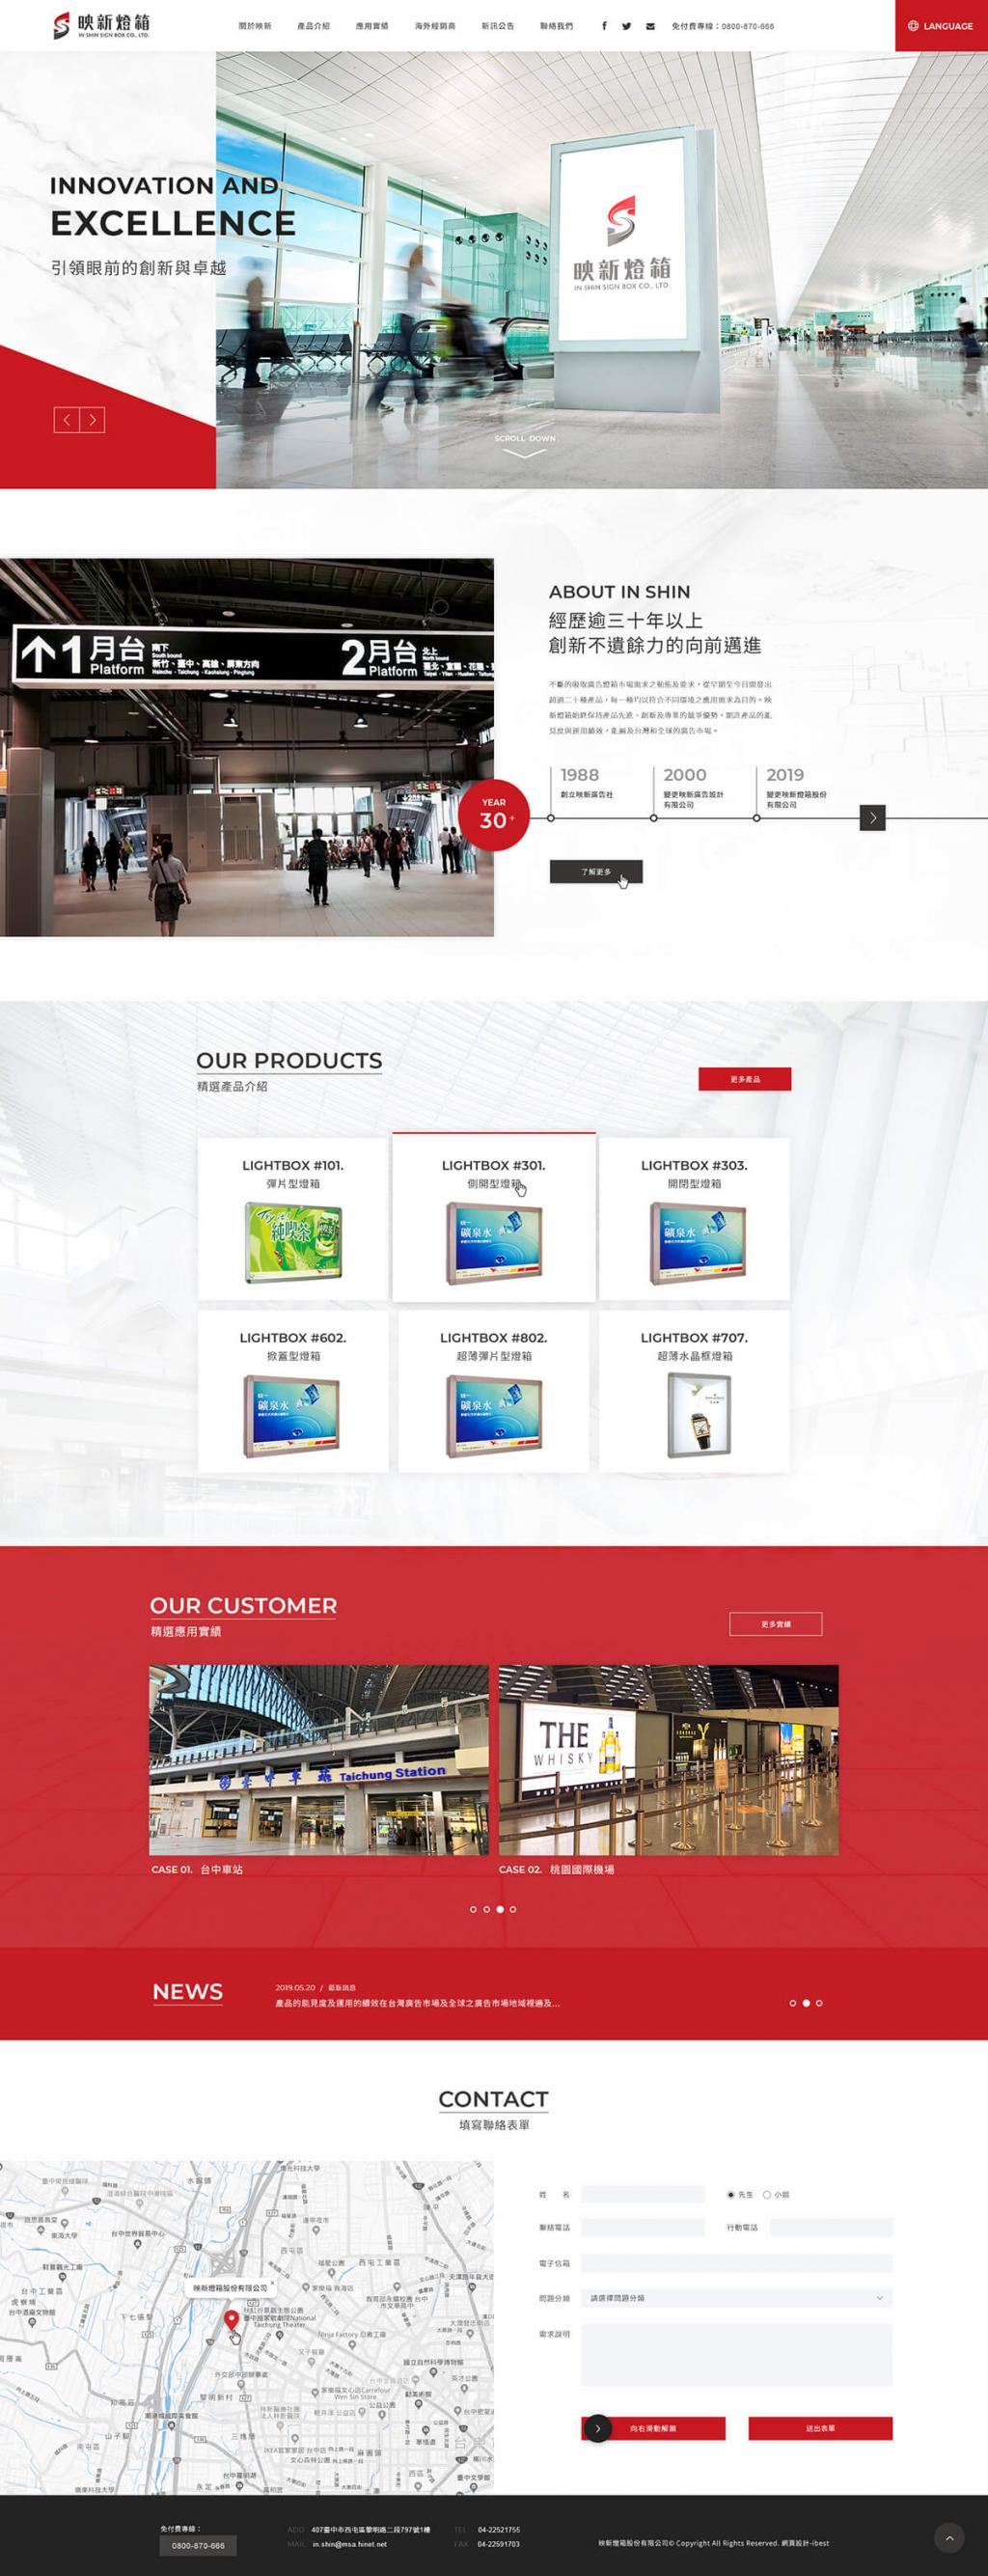 映新燈箱-網頁設計